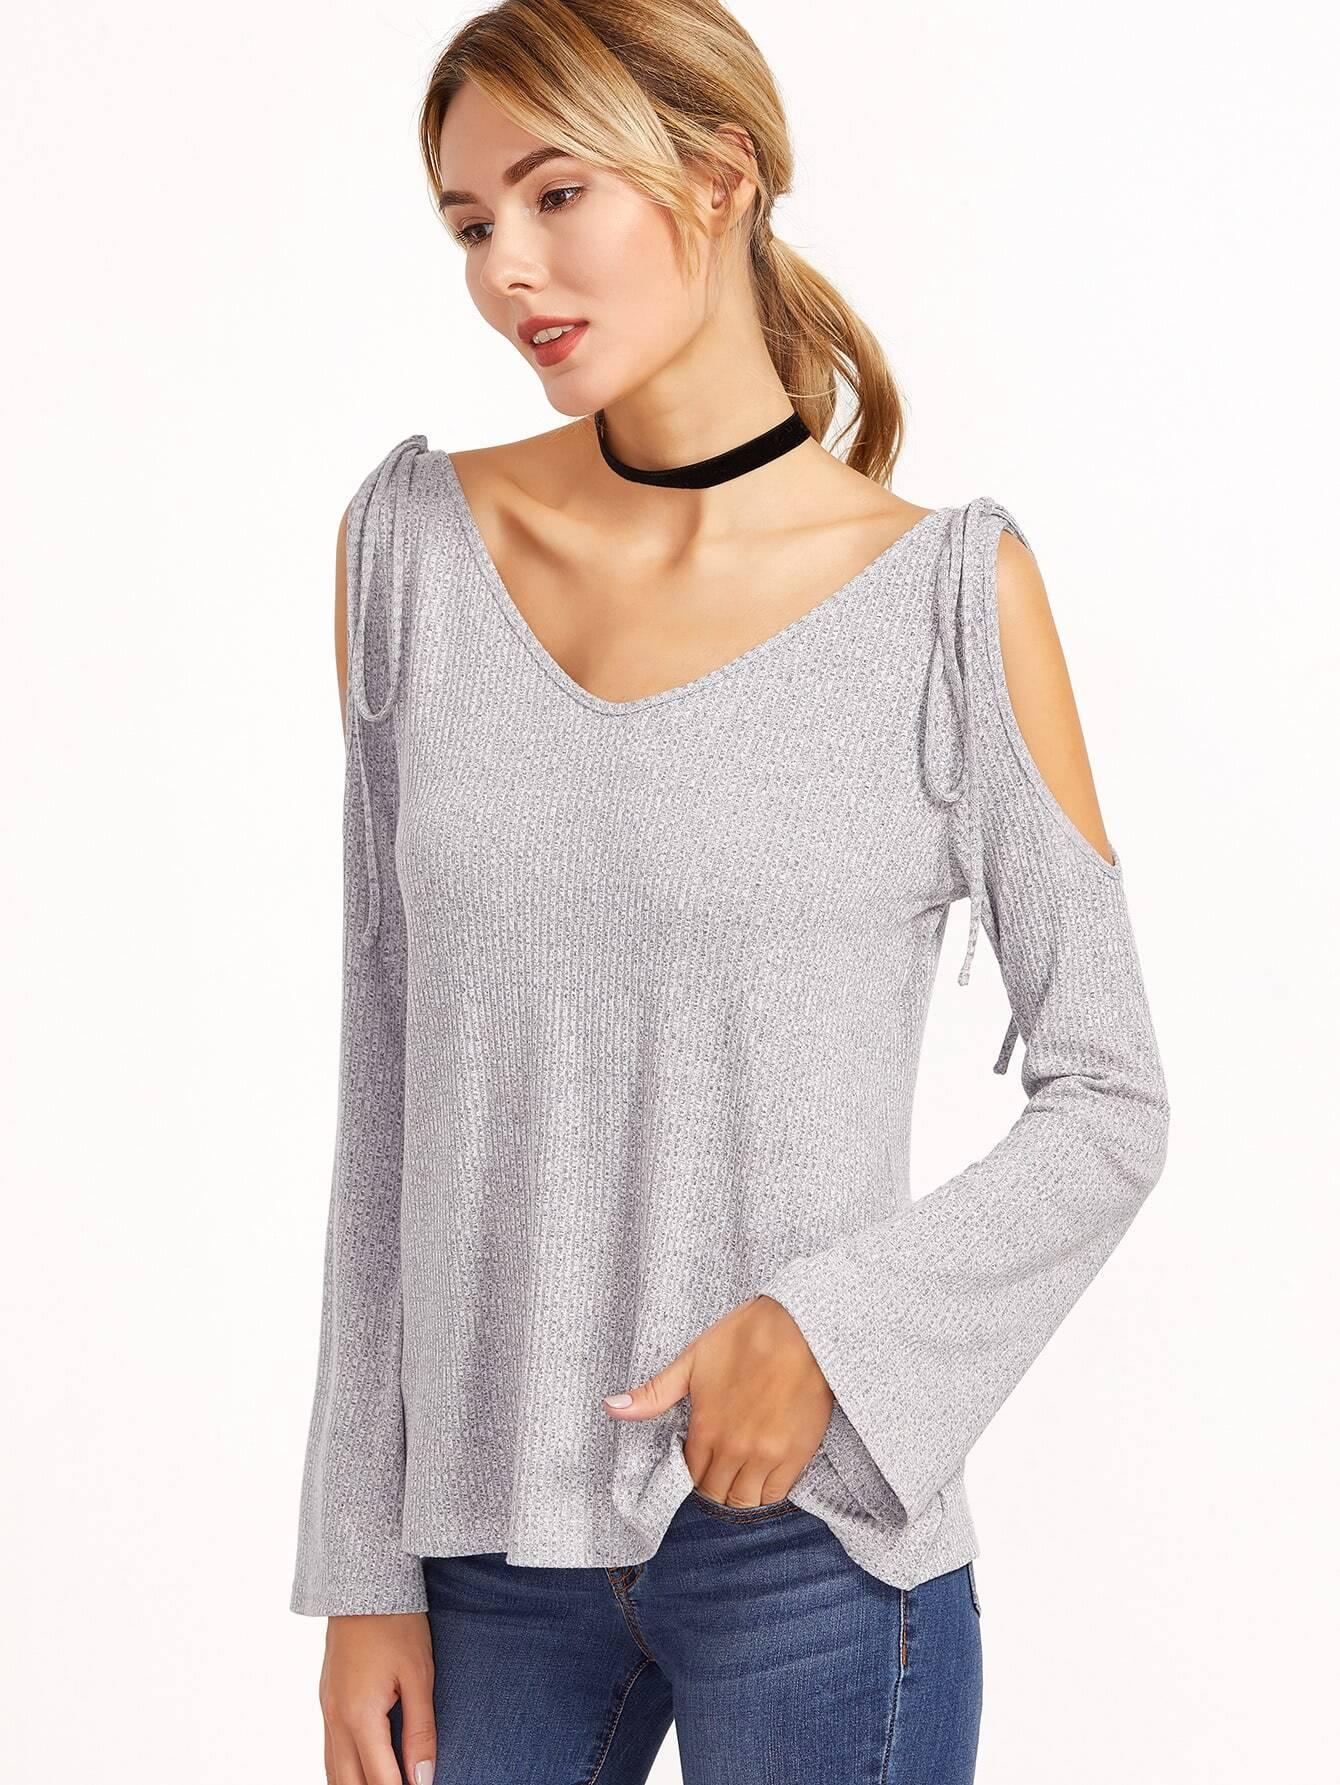 Grey Marled Ribbed Knit Tie Cold Shoulder T-shirt tee161130706